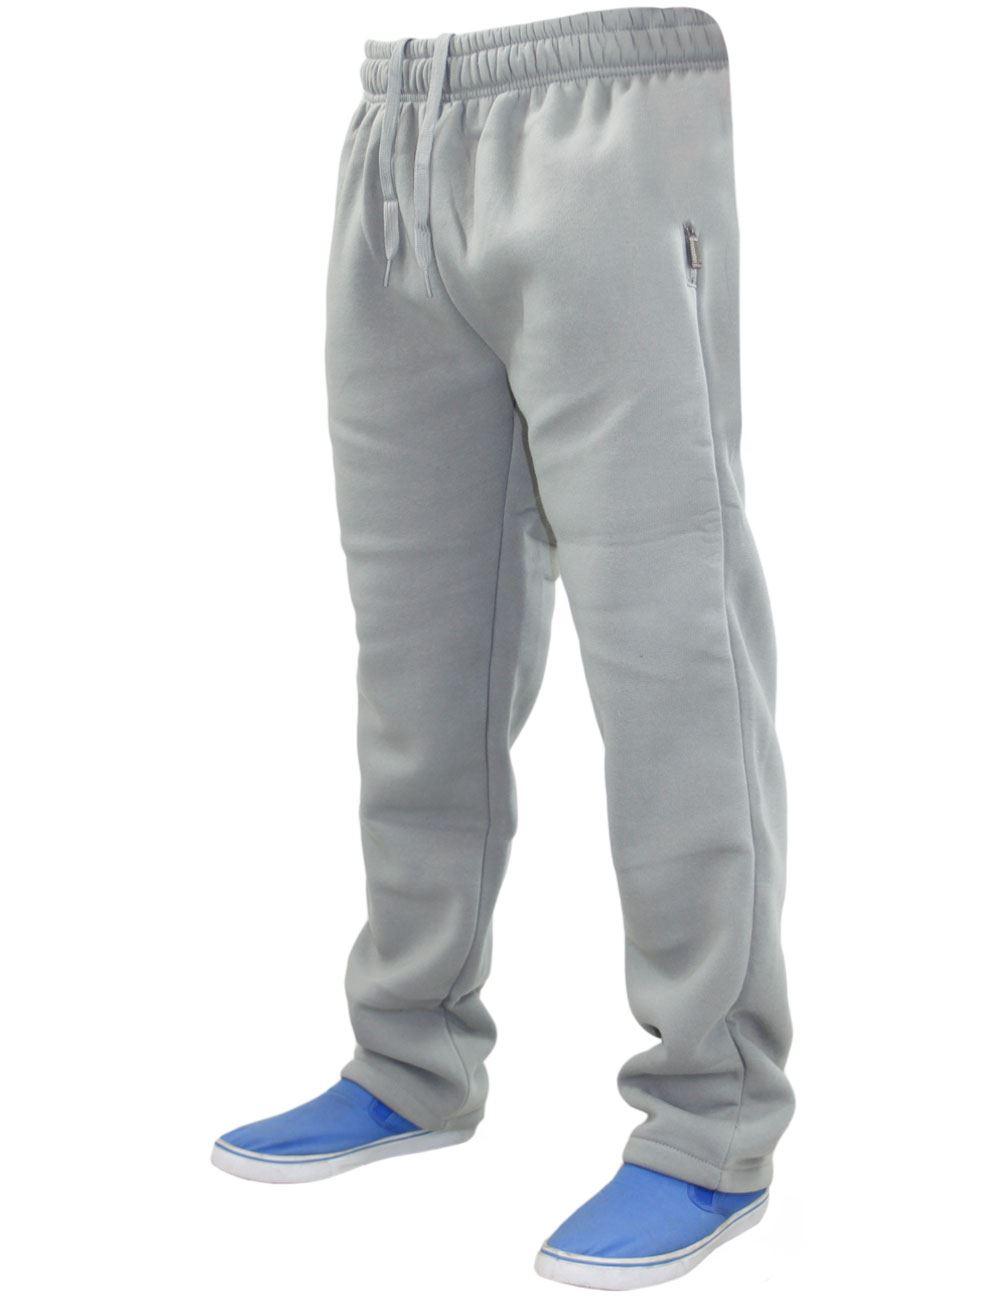 Mens-Women-Plain-Fleece-Joggers-Bottoms-Jogging-Pant-Gym-Fitness-Sports-Trousers thumbnail 32